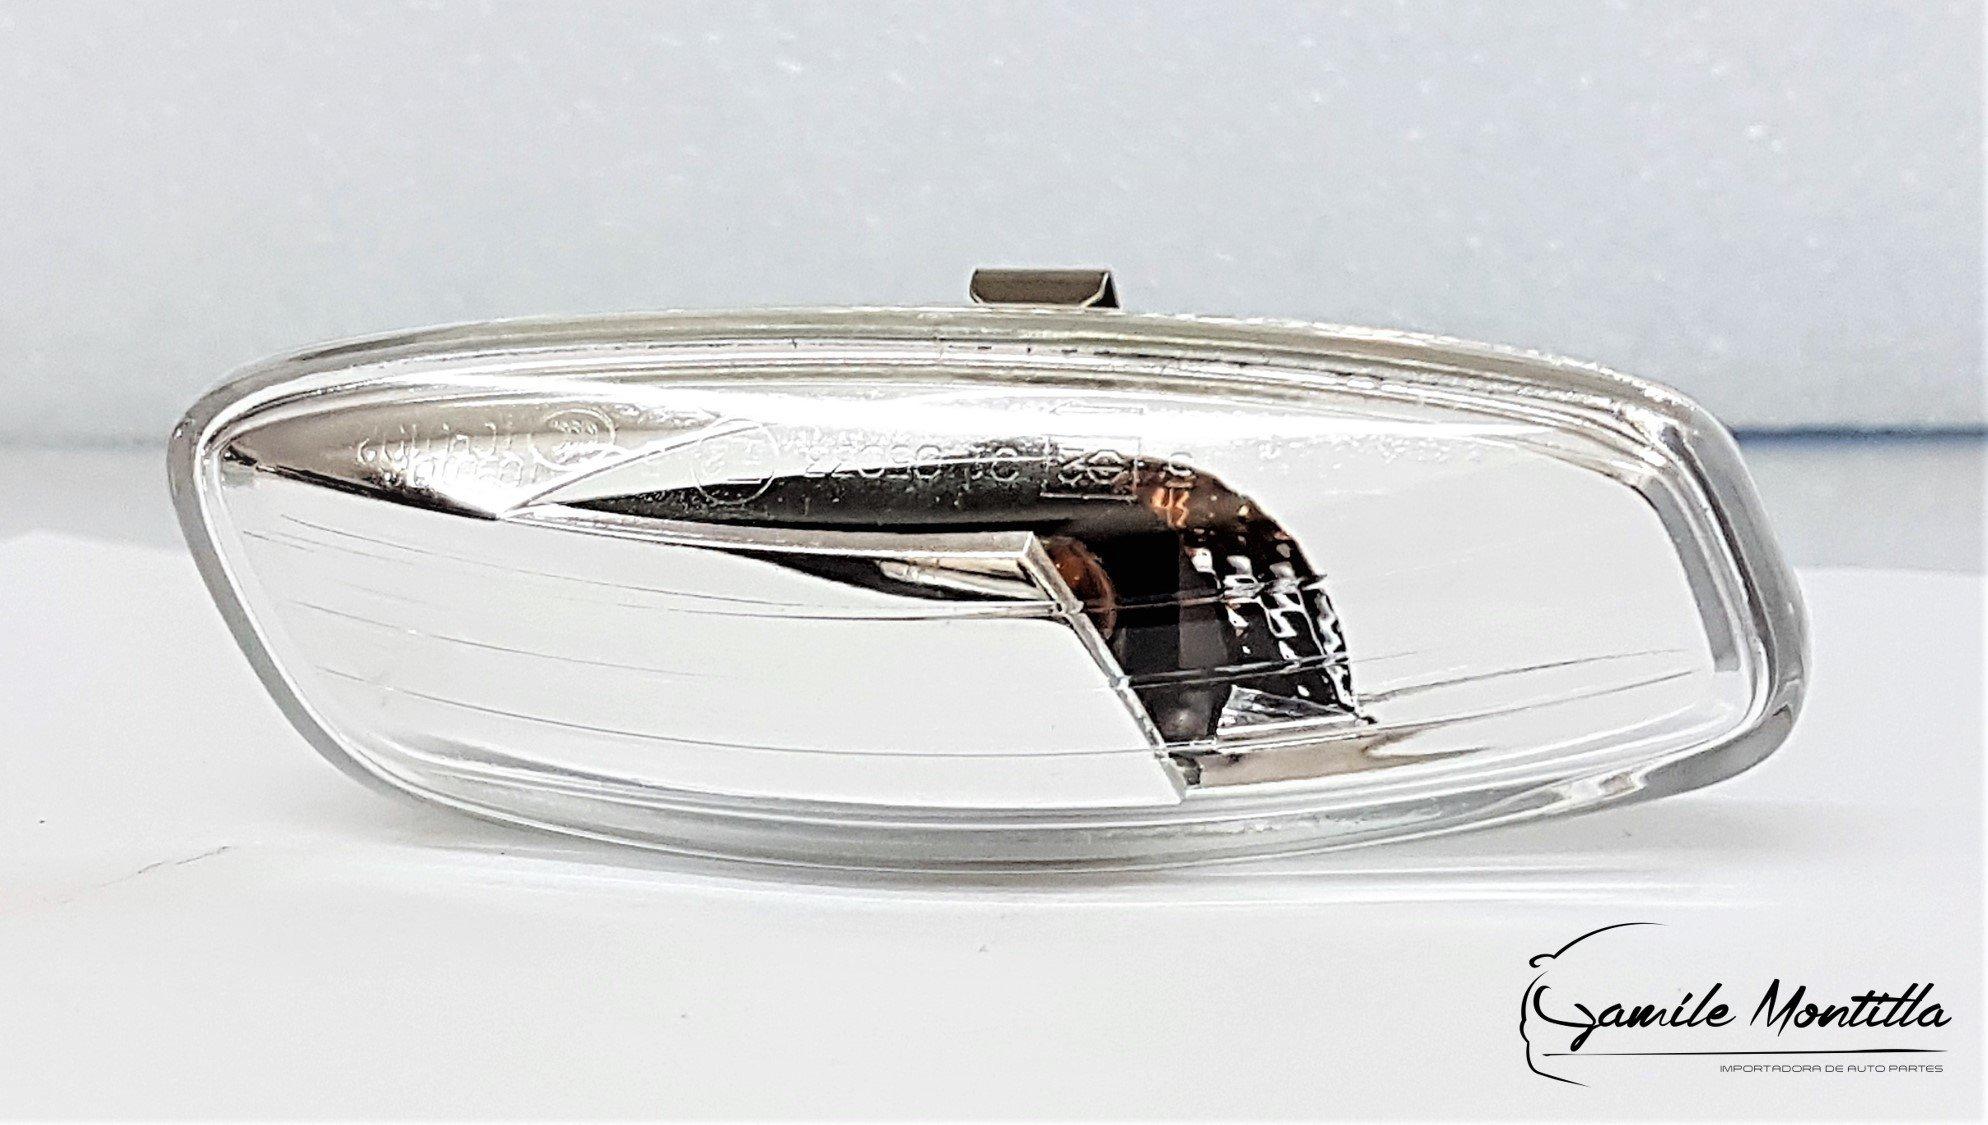 1 cristal espejo exterior TyC 309-0092-1 adecuado para Citroën c Fiat Peugeot